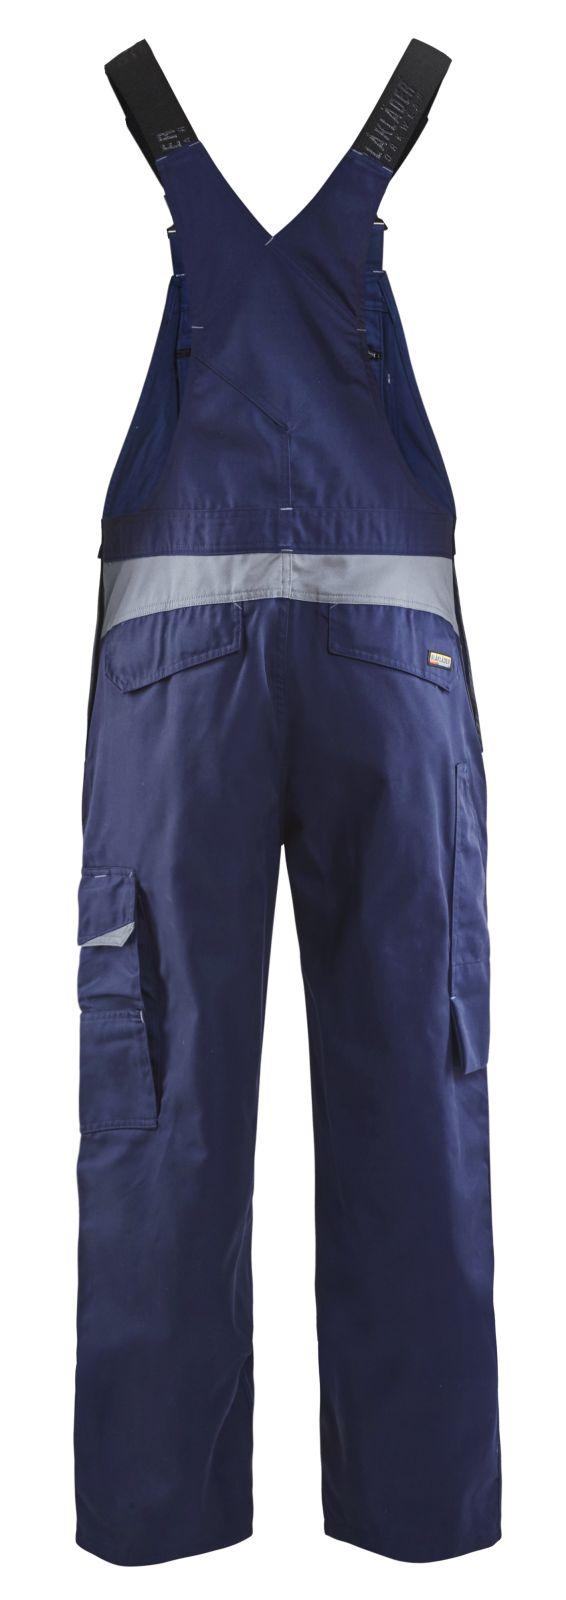 Blaklader Amerikaanse overalls 26641800 marineblauw-grijs(8994)